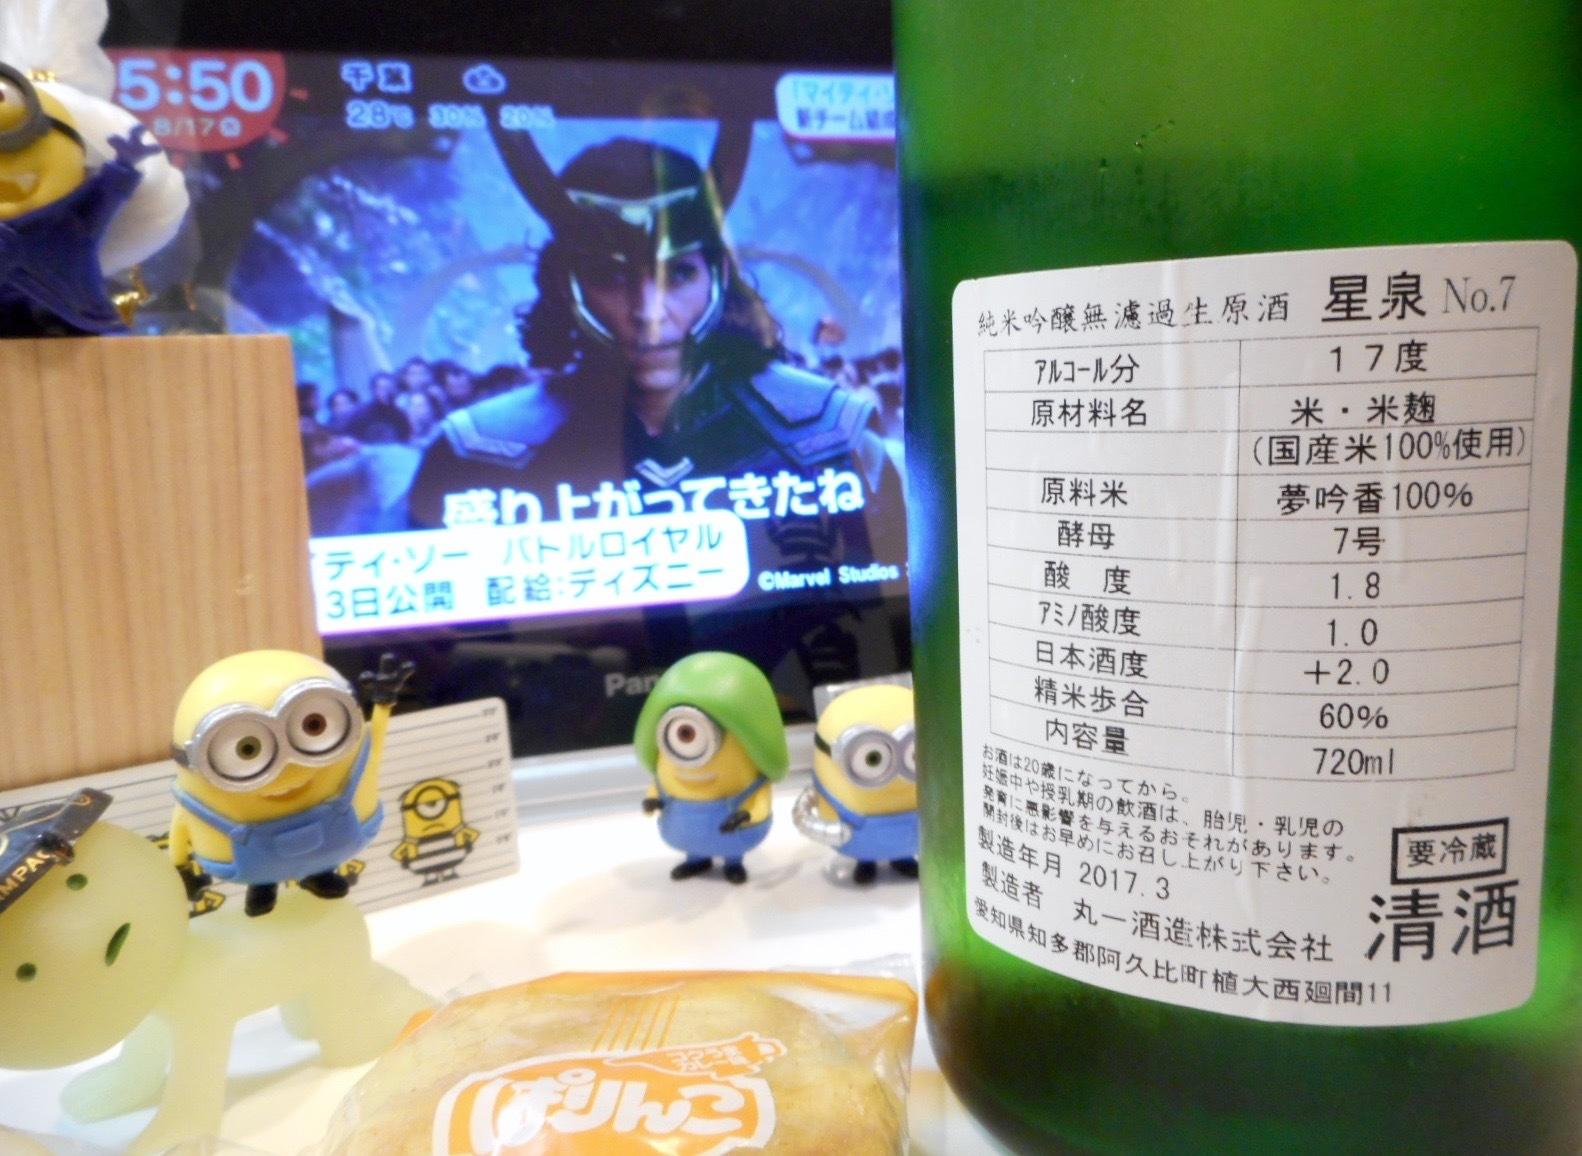 hoshiizumi_jungin7_28by2.jpg